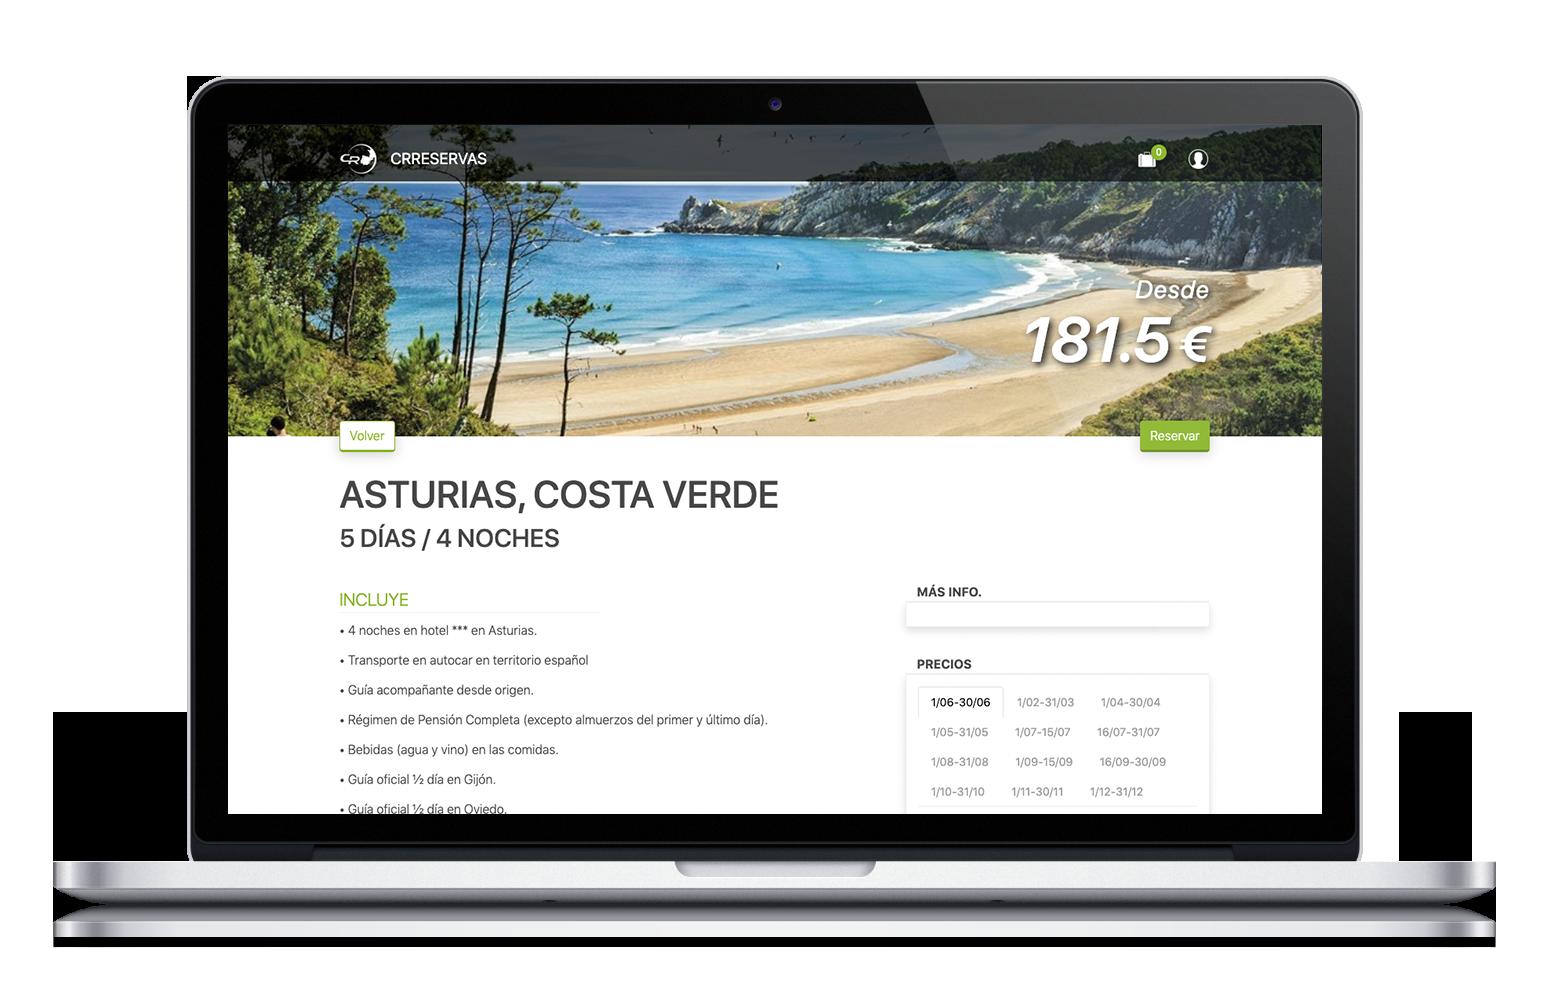 Degaltec_paquetes_viajes_grupos